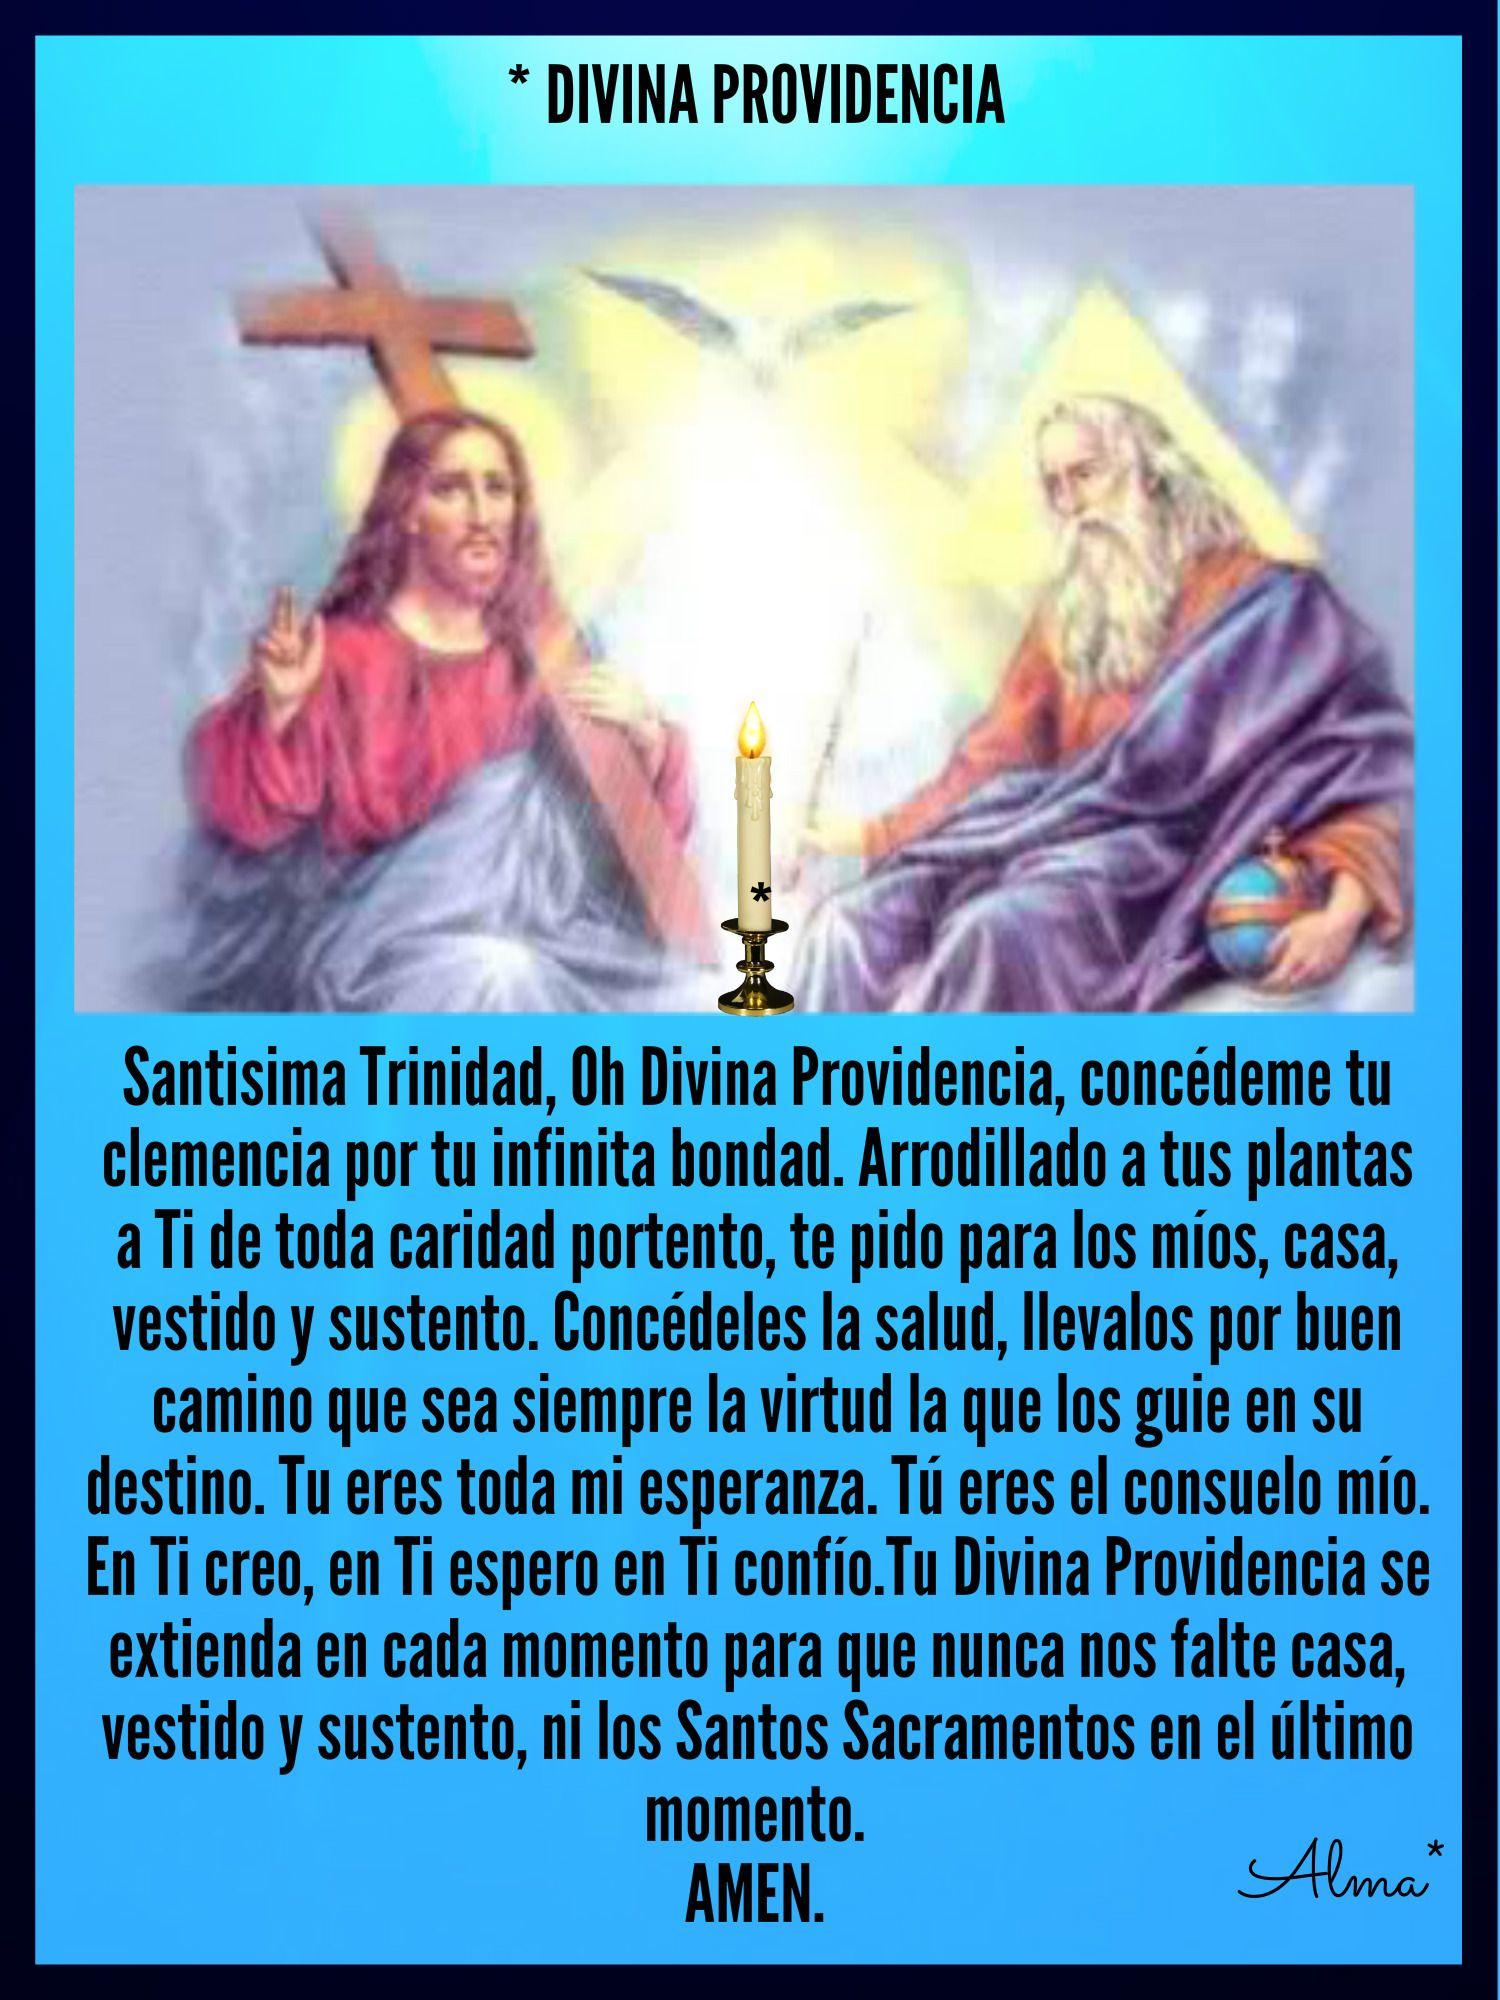 Divina Providencia Santisima Trinidad Oh Divina